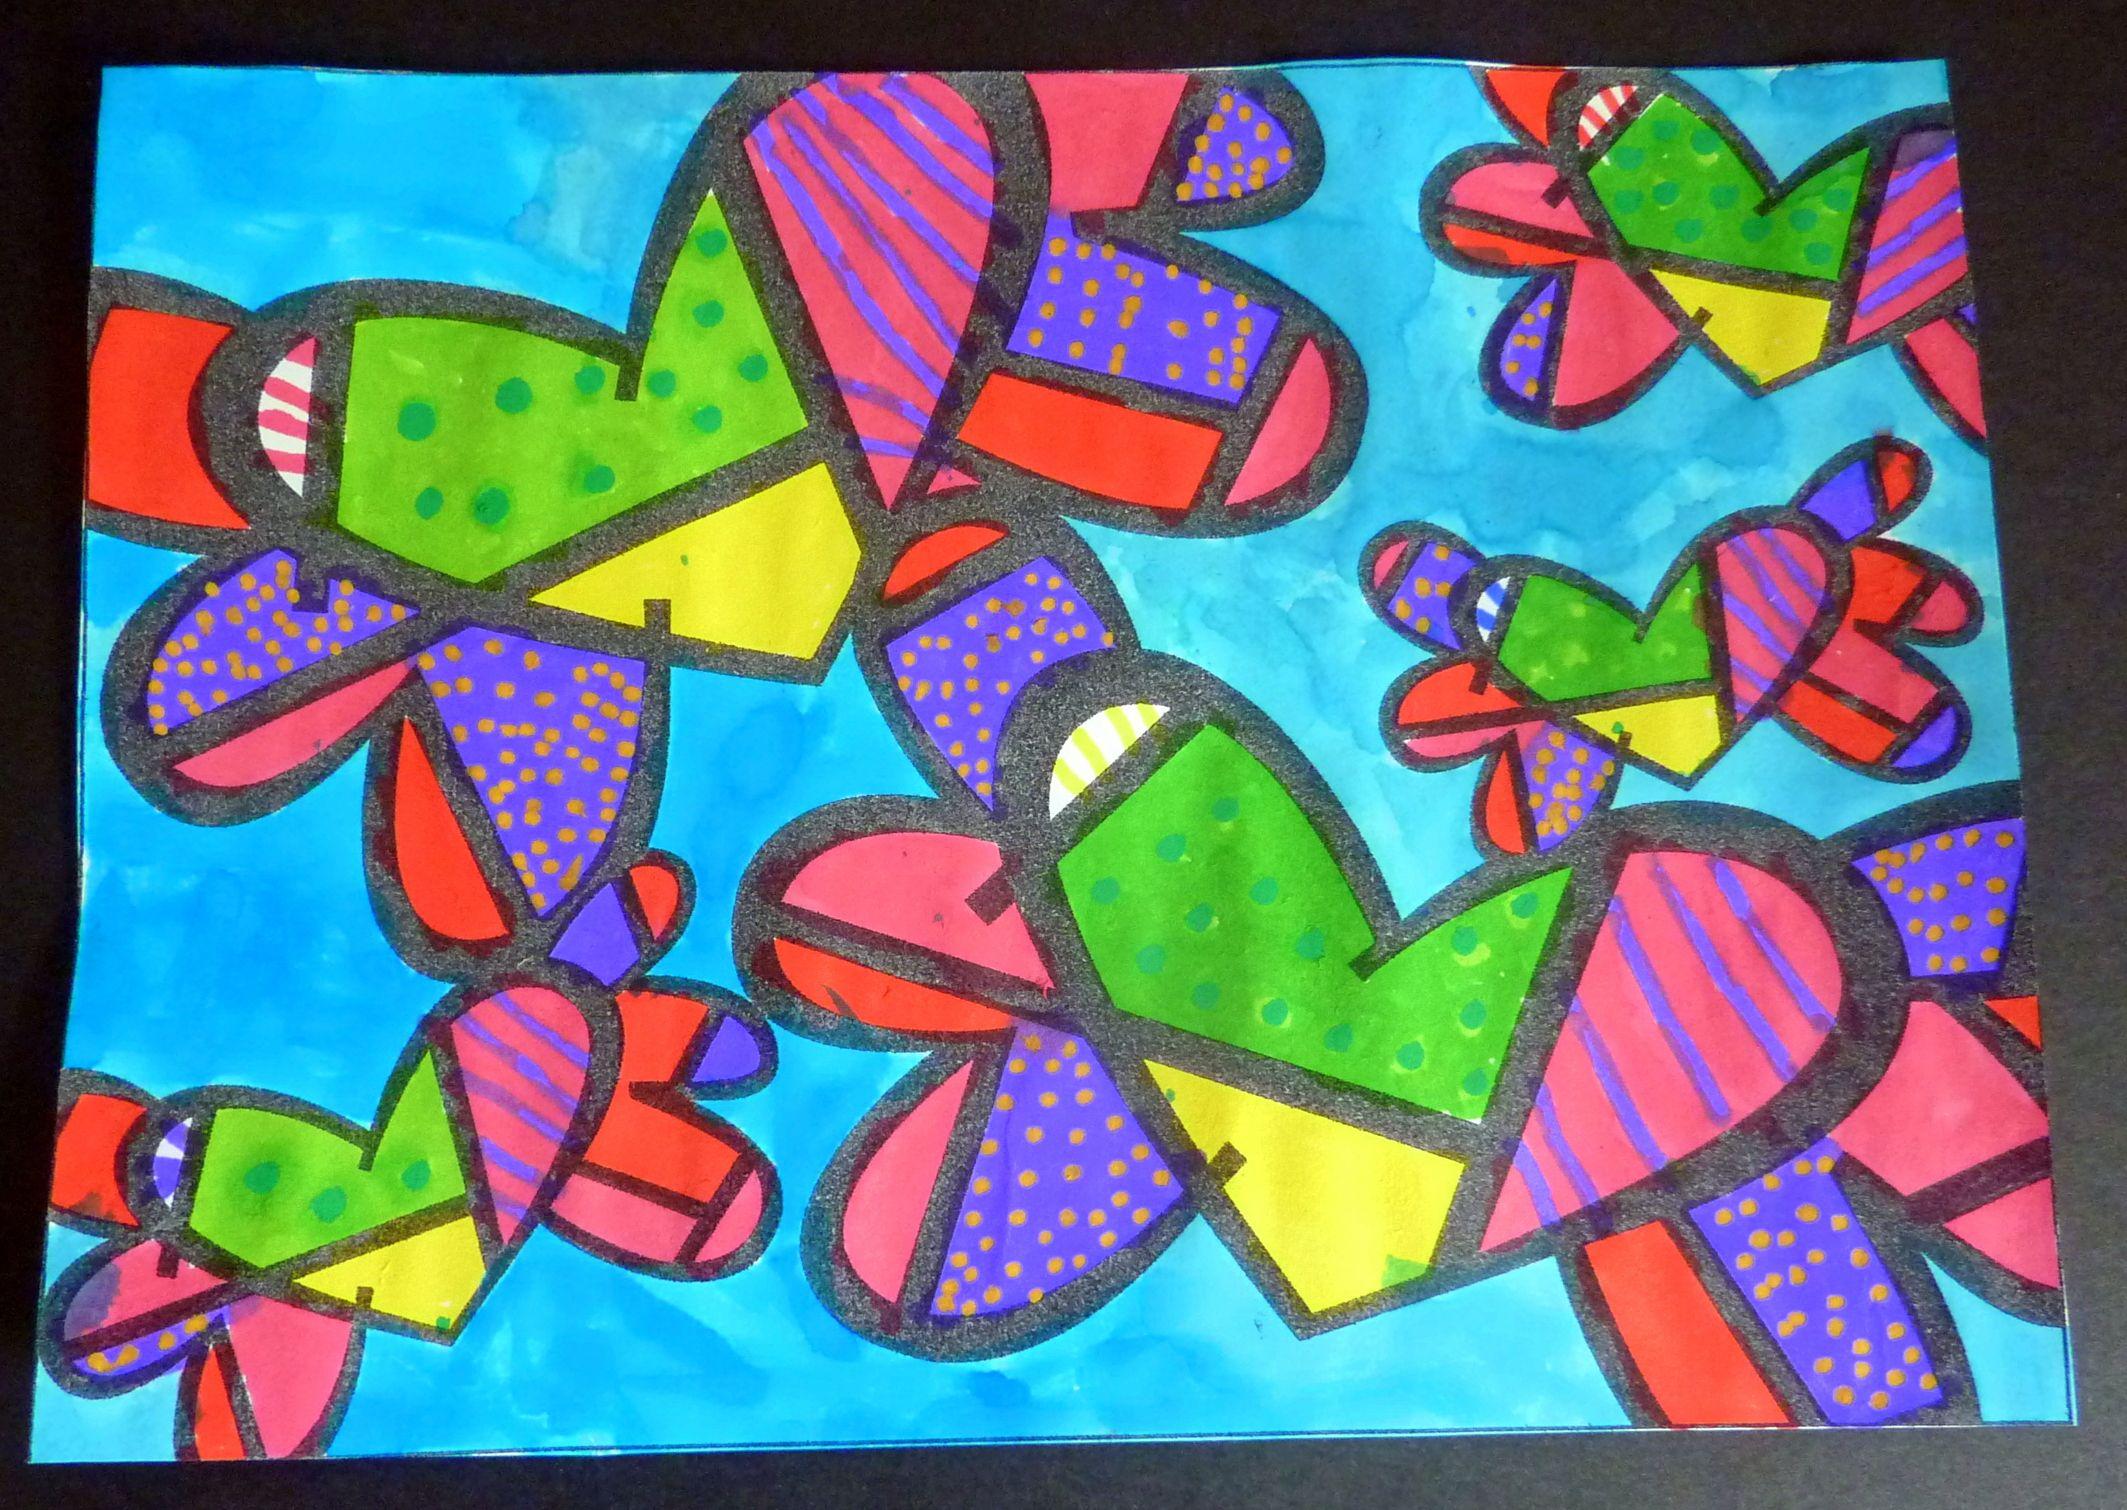 Coloriage Fleur Britto.Arts Visuels Inspires De Romero Britto Classes Valentines Art